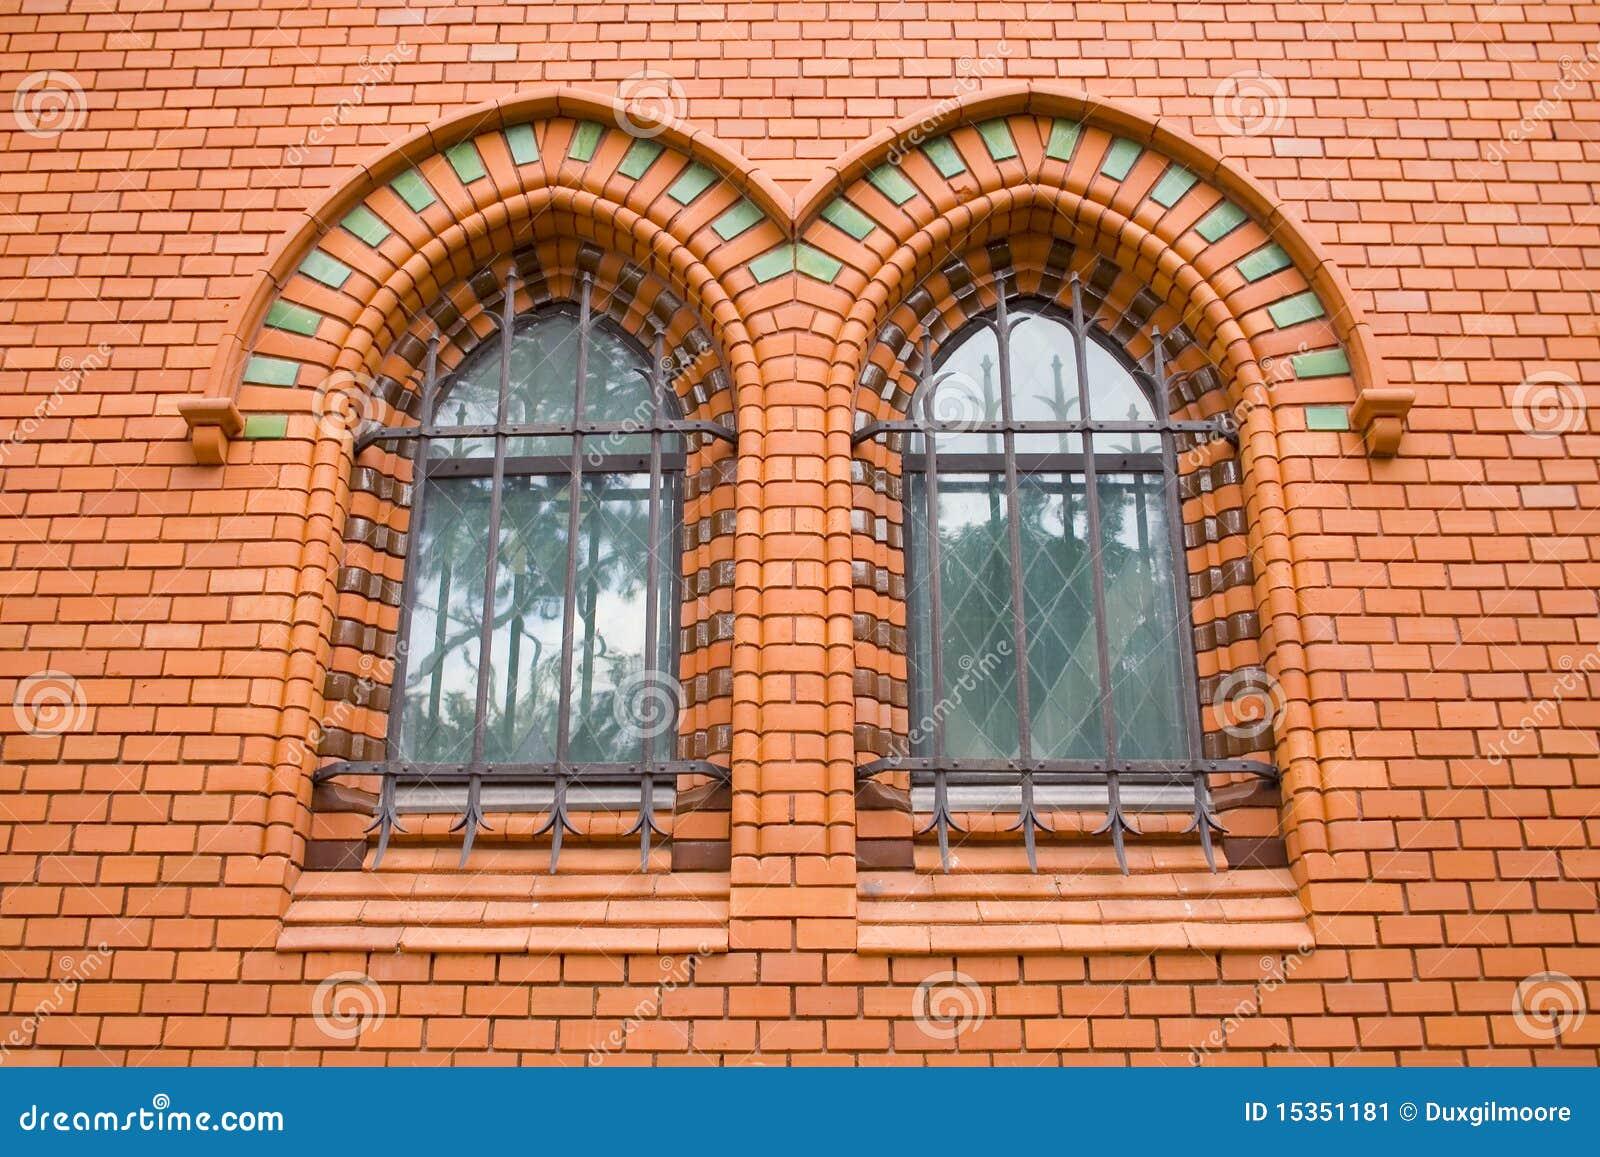 Red Bricks Church Ornamental Windows Stock Image - Image: 15351181